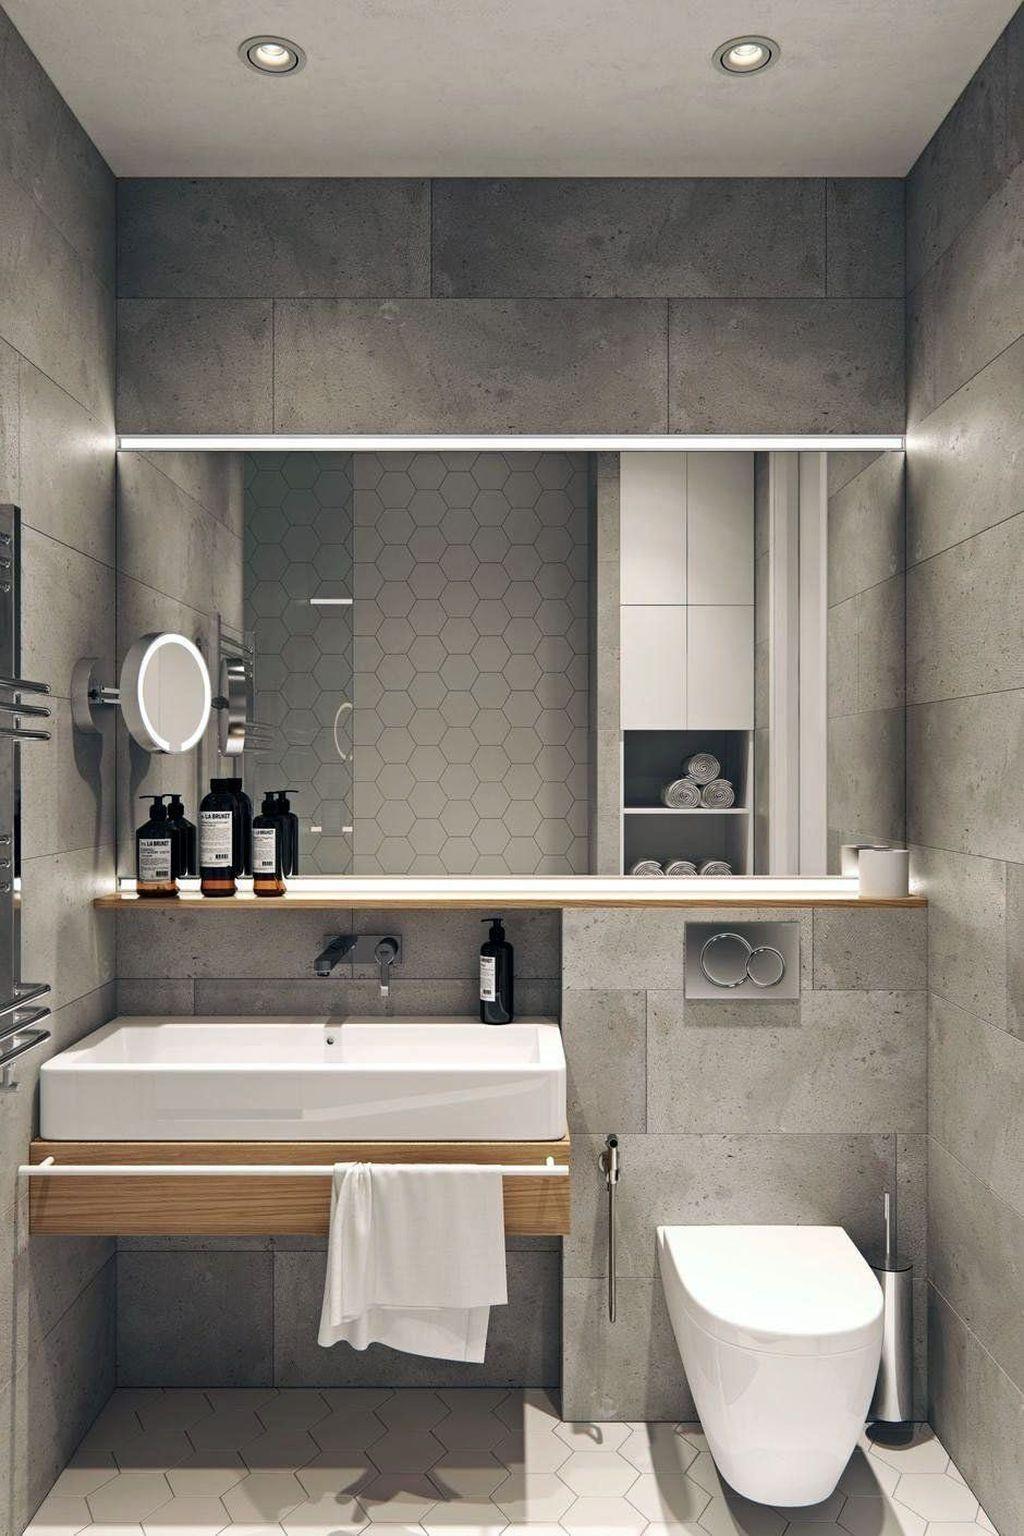 Awesome 39 Best Minimalist Bathroom Design Ideas For Home Decor Restroom Design Minimalist Bathroom Minimalist Bathroom Design Minimalist bathroom design ideas